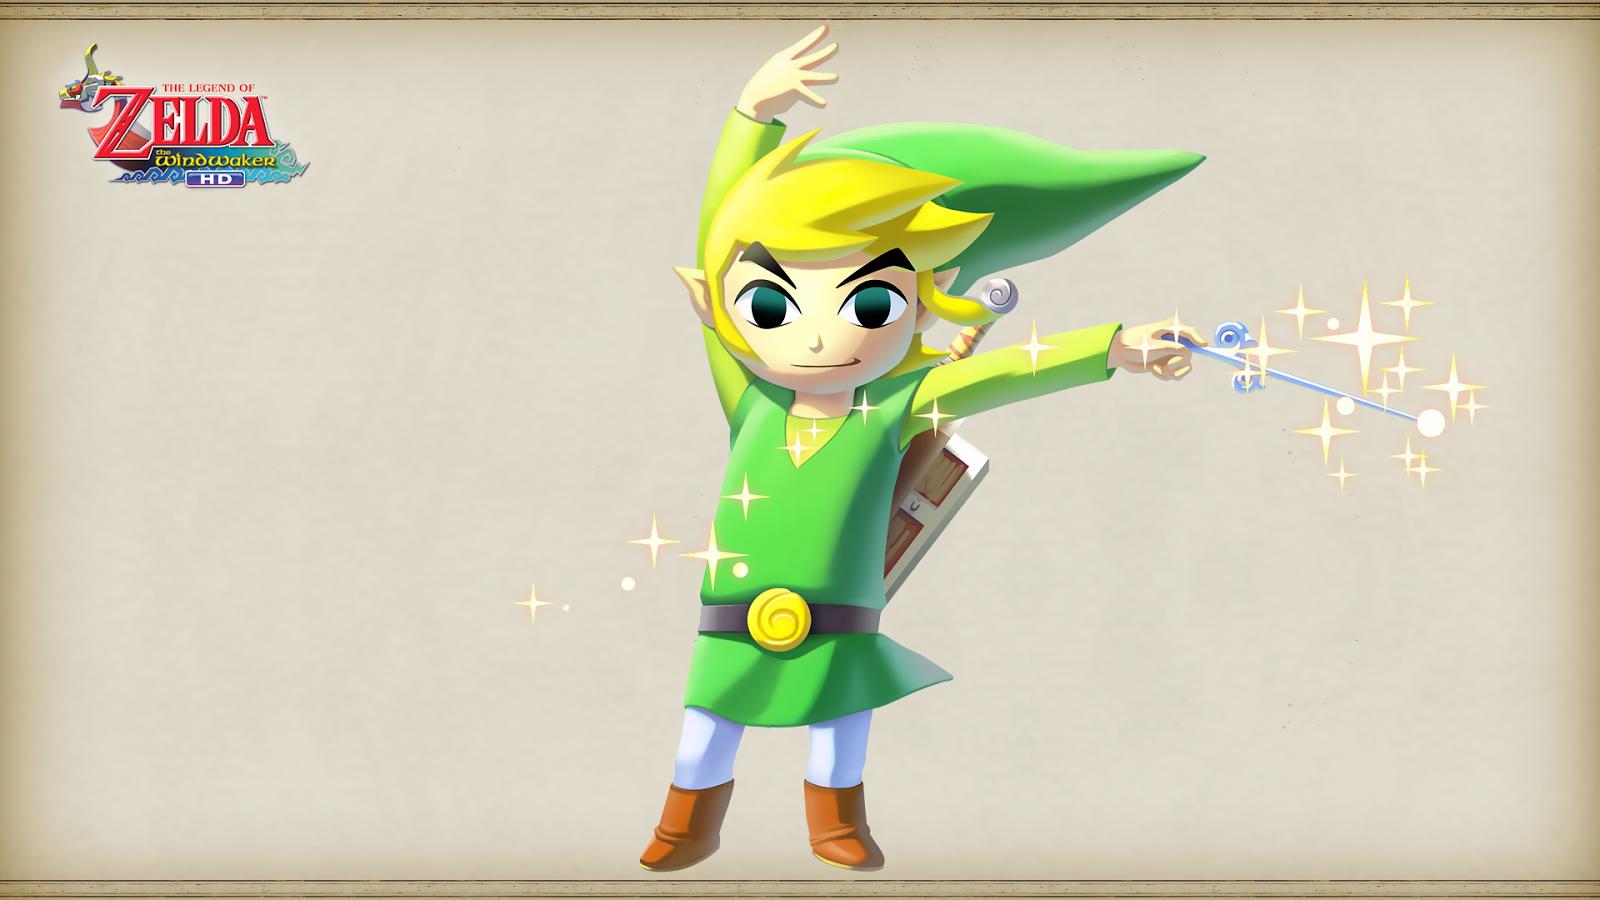 Wind Waker Hd Wallpaper: Game Art X: The Legend Of Zelda The Wind Waker HD Wallpapers